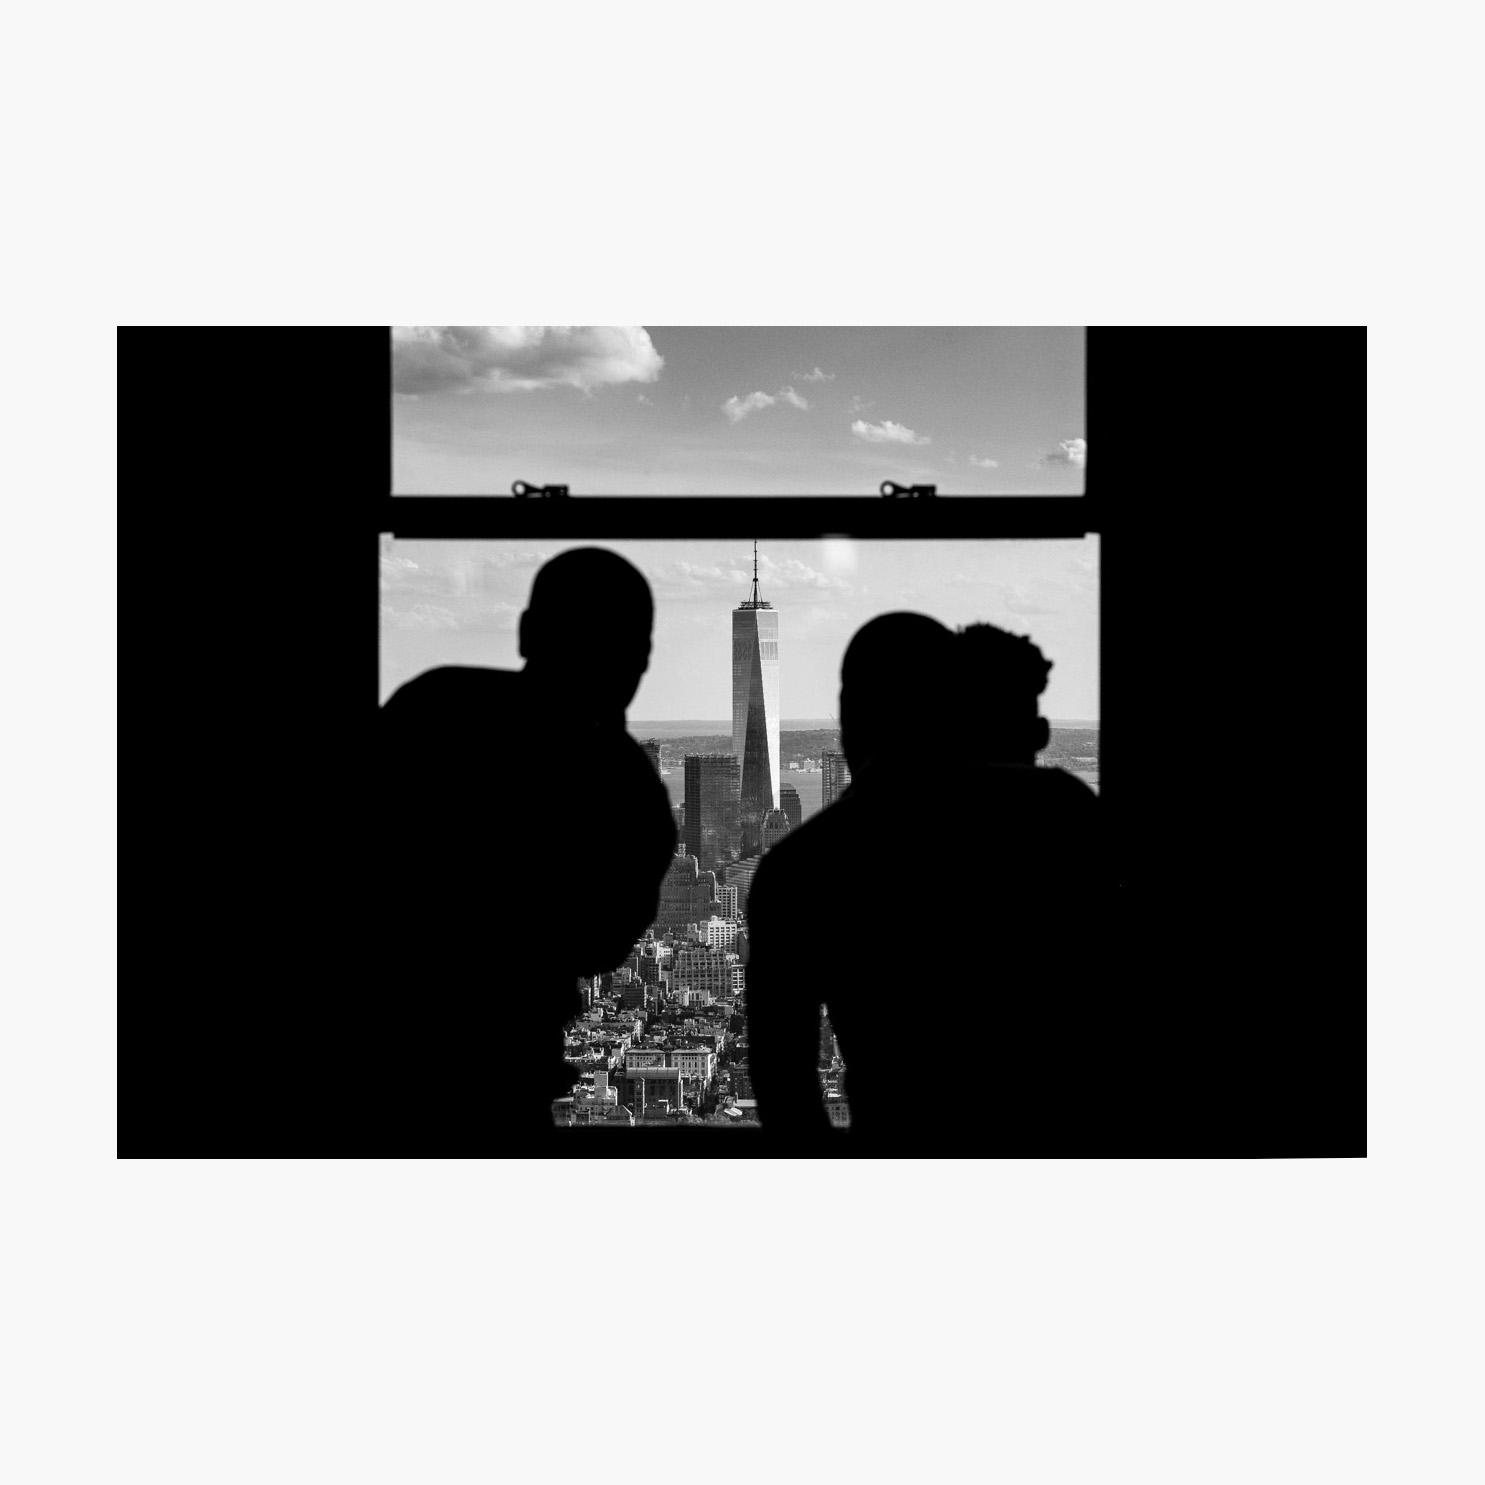 ©-2018-Harry-W-Edmonds-London-Photographer-Missing-the-Shot-PN06.jpg